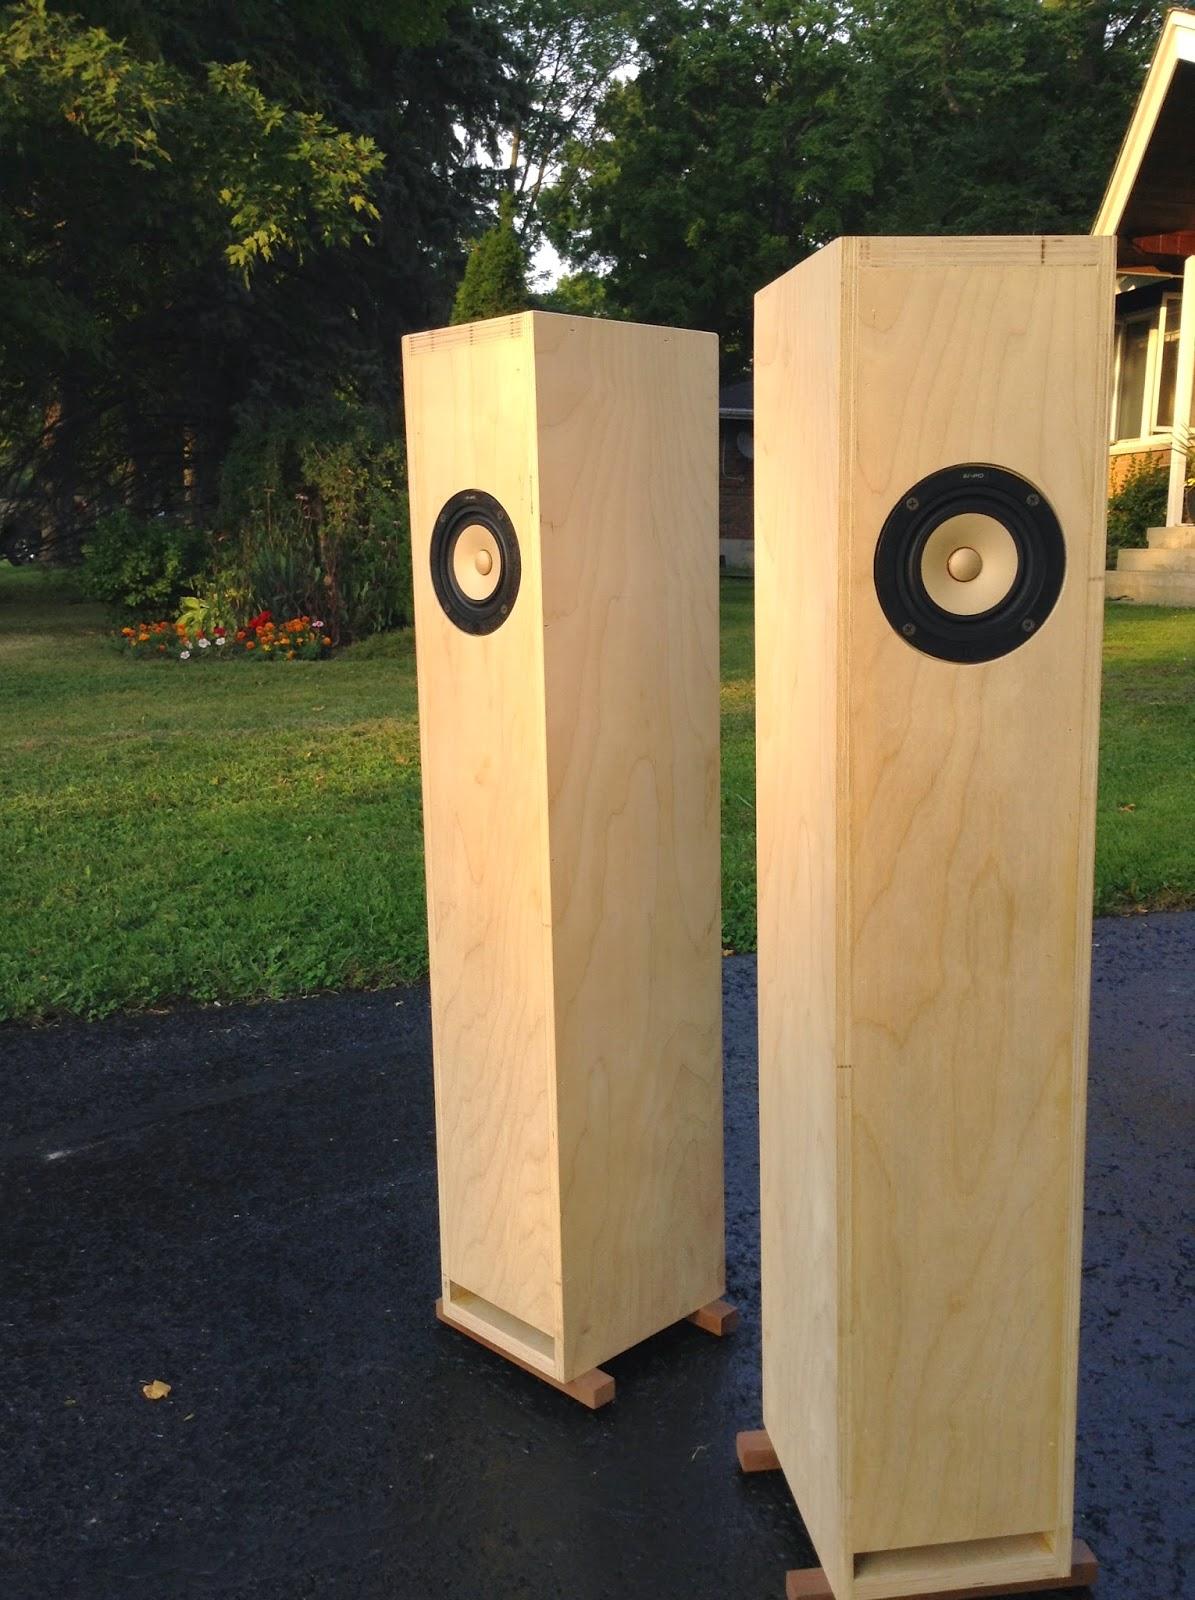 Lautsprechershop kits construccion altavoces Photo%2B1